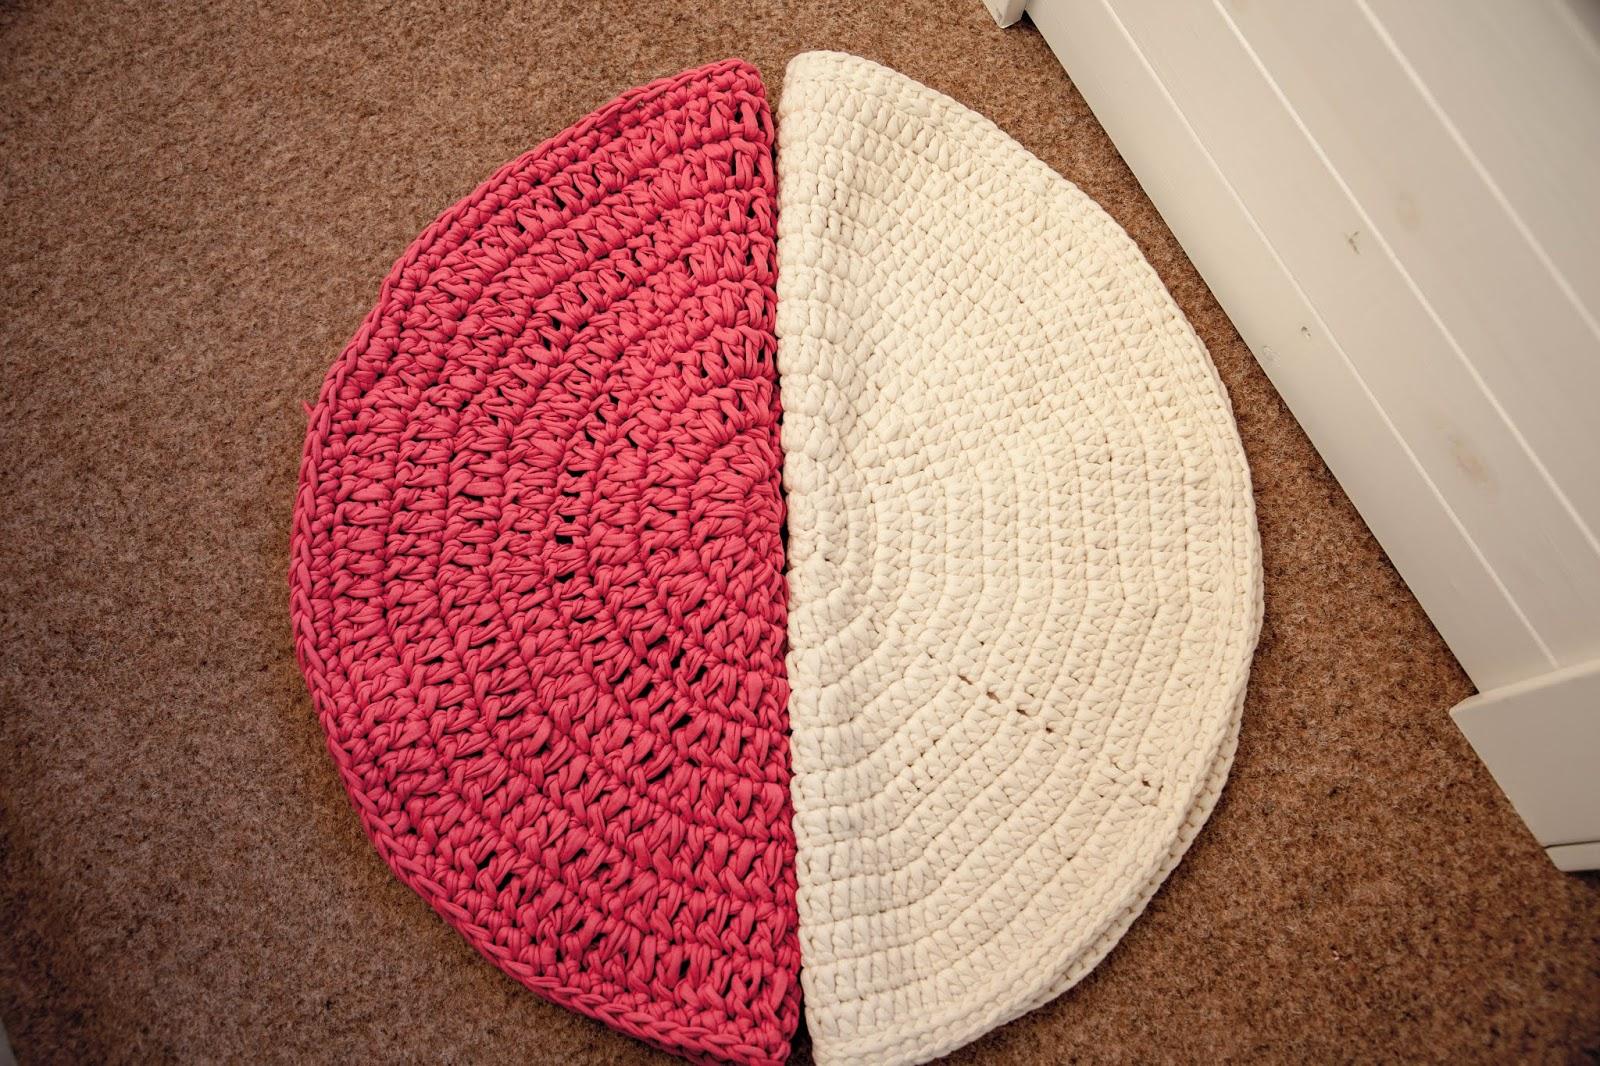 virkattu matto strömsö matonkude